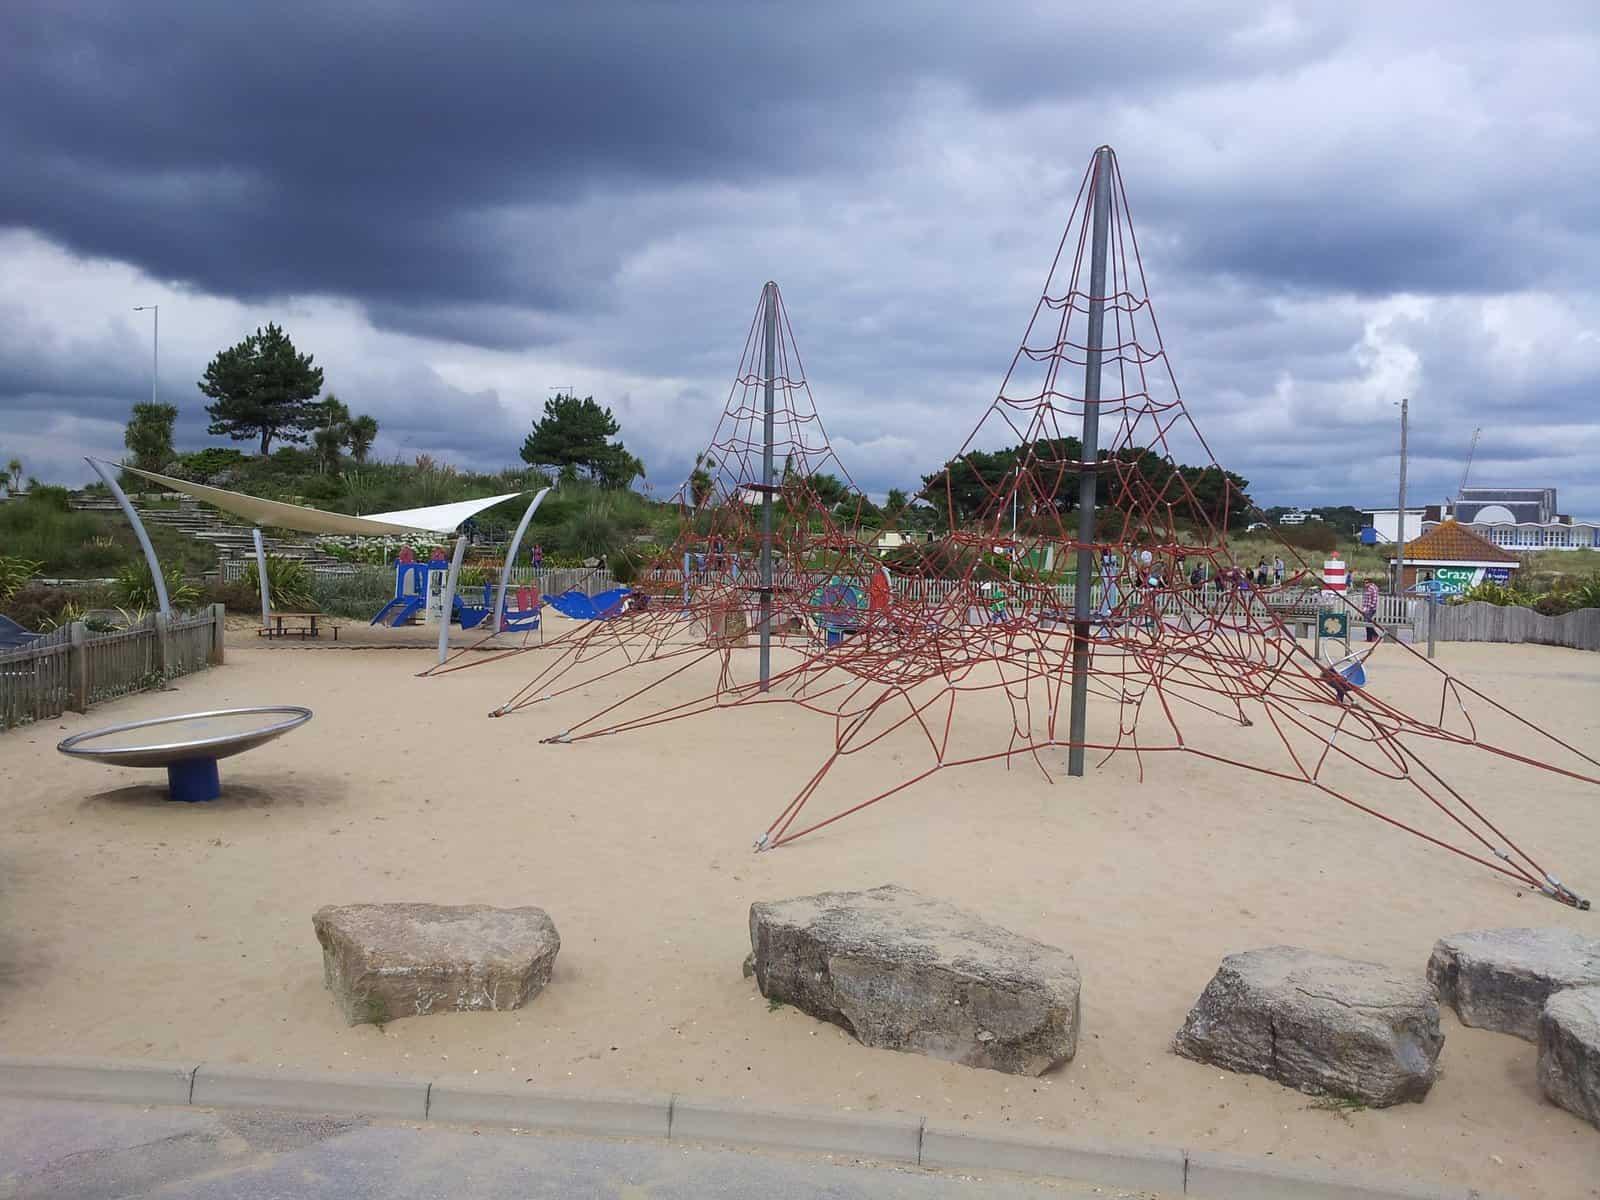 Sandbanks Play Area